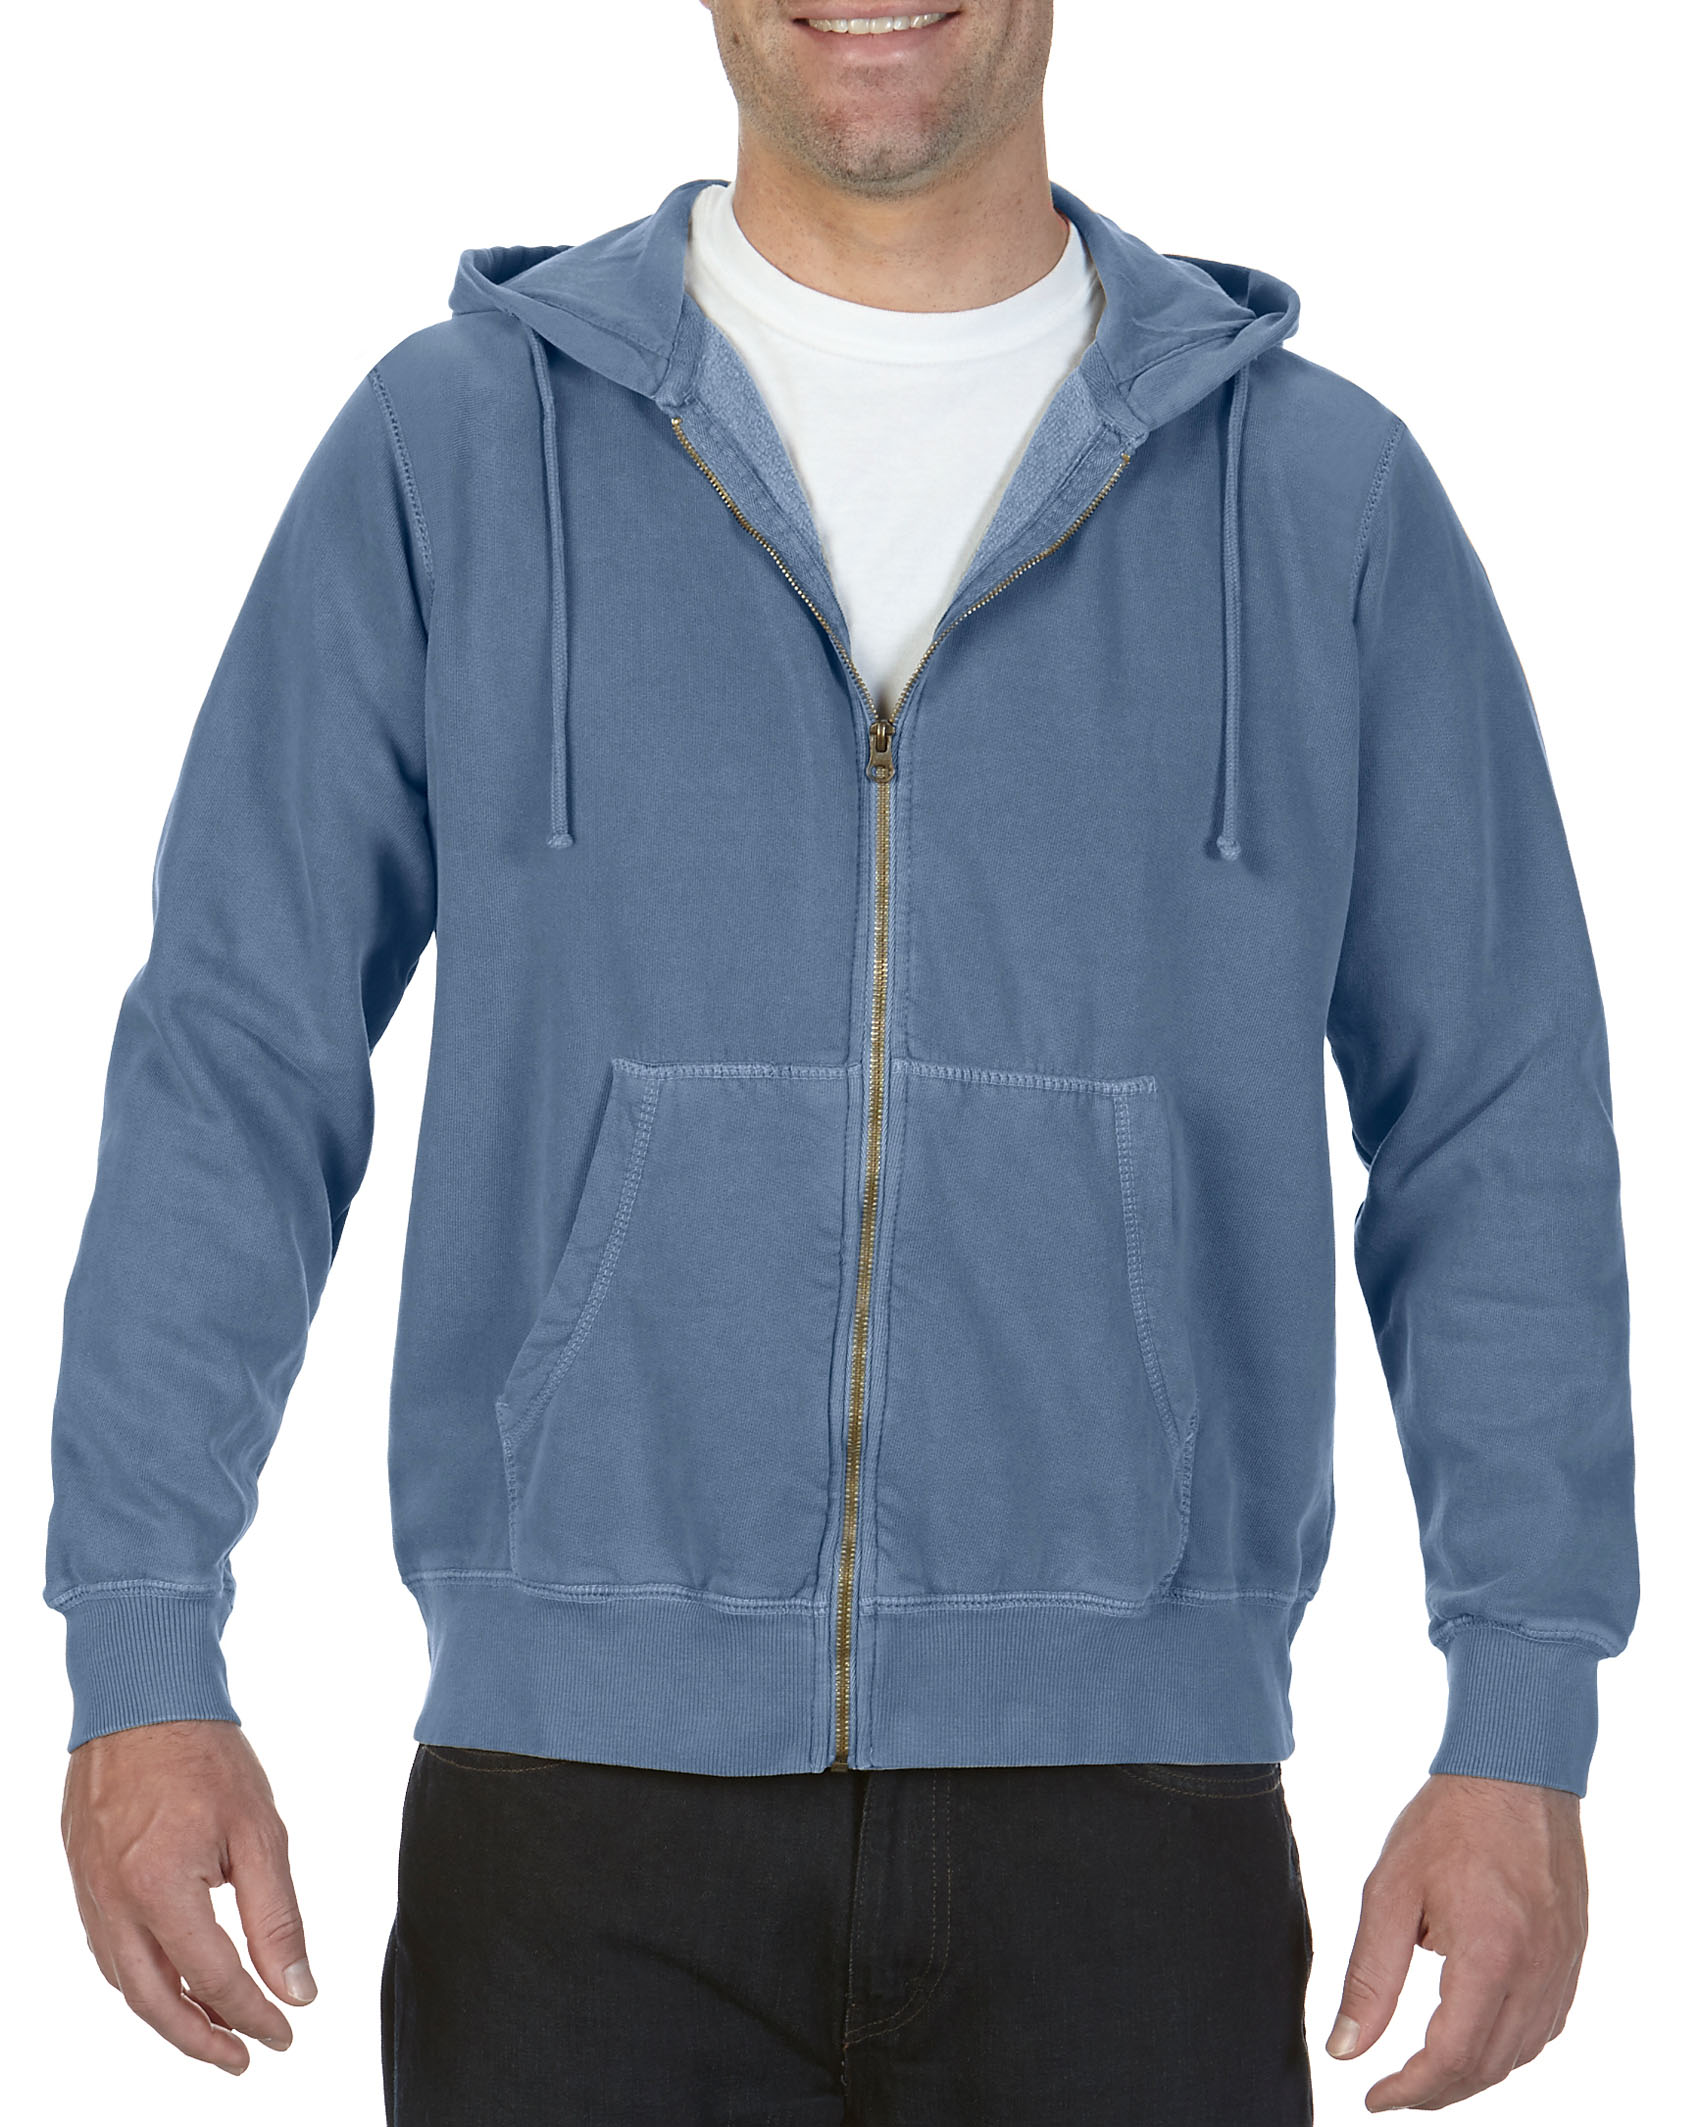 ComCol Hooded Sweatshirt Adult Full Zip